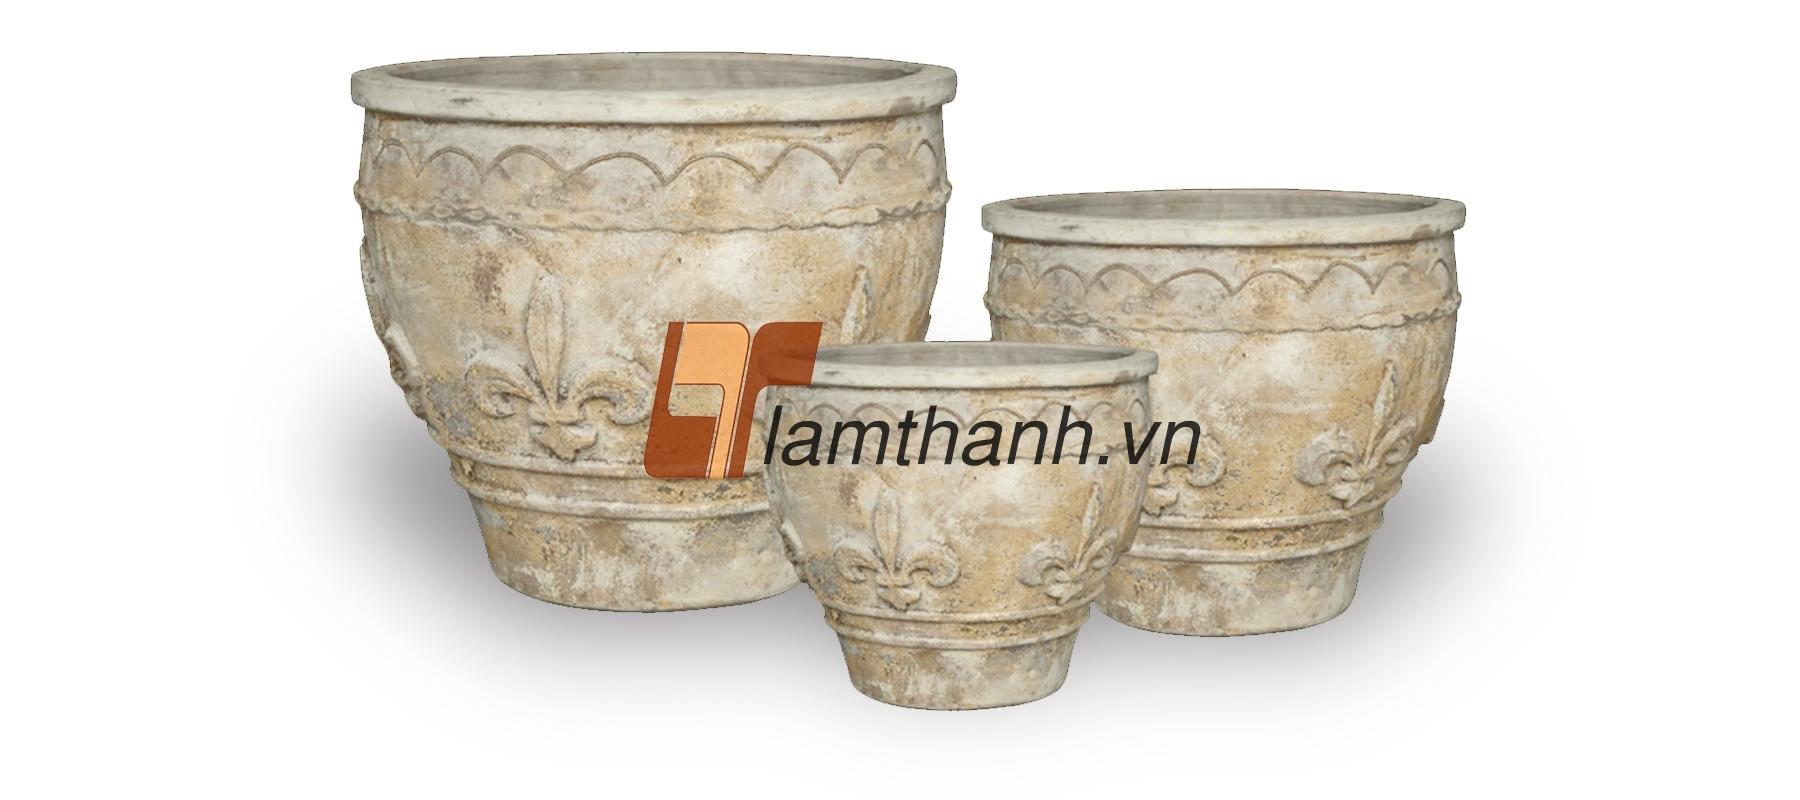 vietnam ceramic vietnam terracotta02